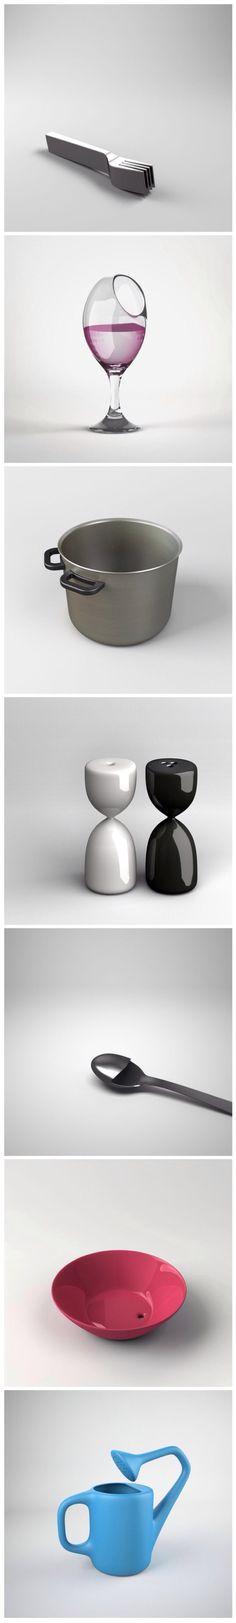 Deliberately Inconvenient Everyday Objects. Katerina Kamprani. twistedsifter.com